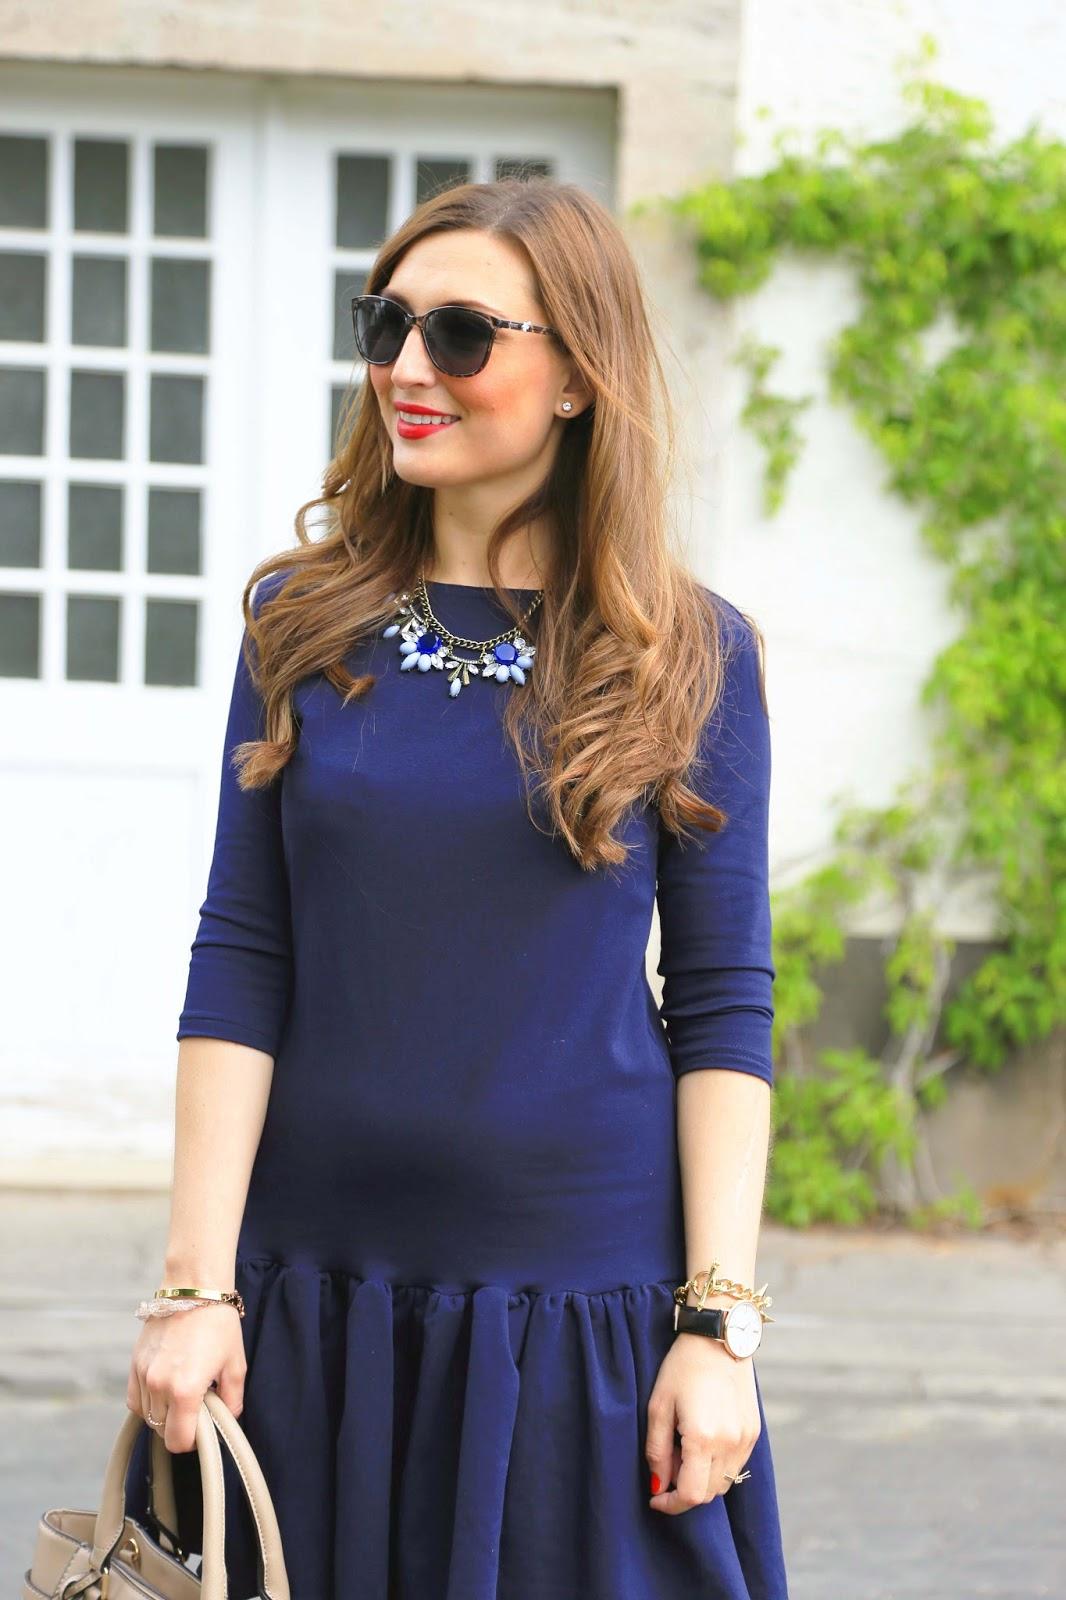 Lippenstift fur blaues kleid